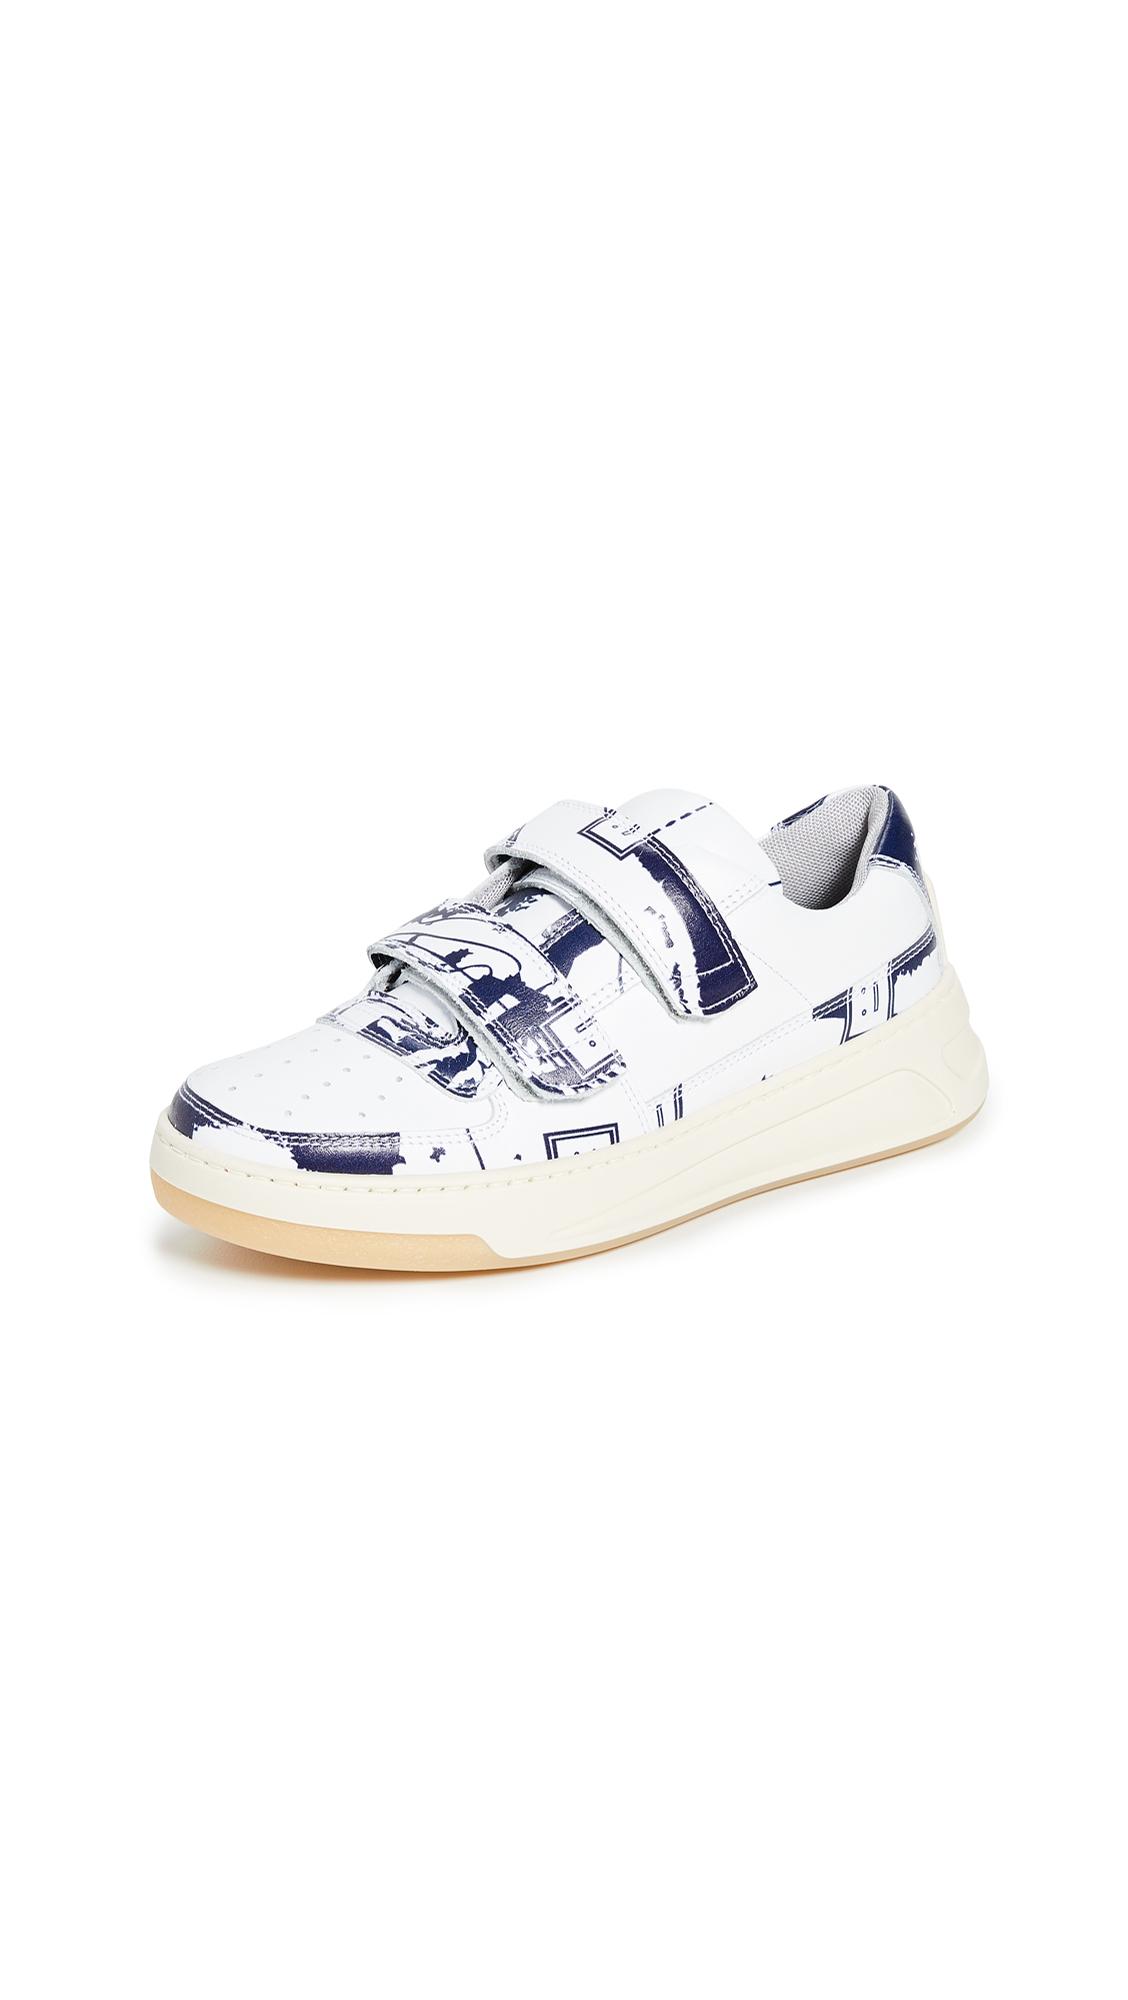 Acne Studios Steffey Map Sneakers - White/Blue